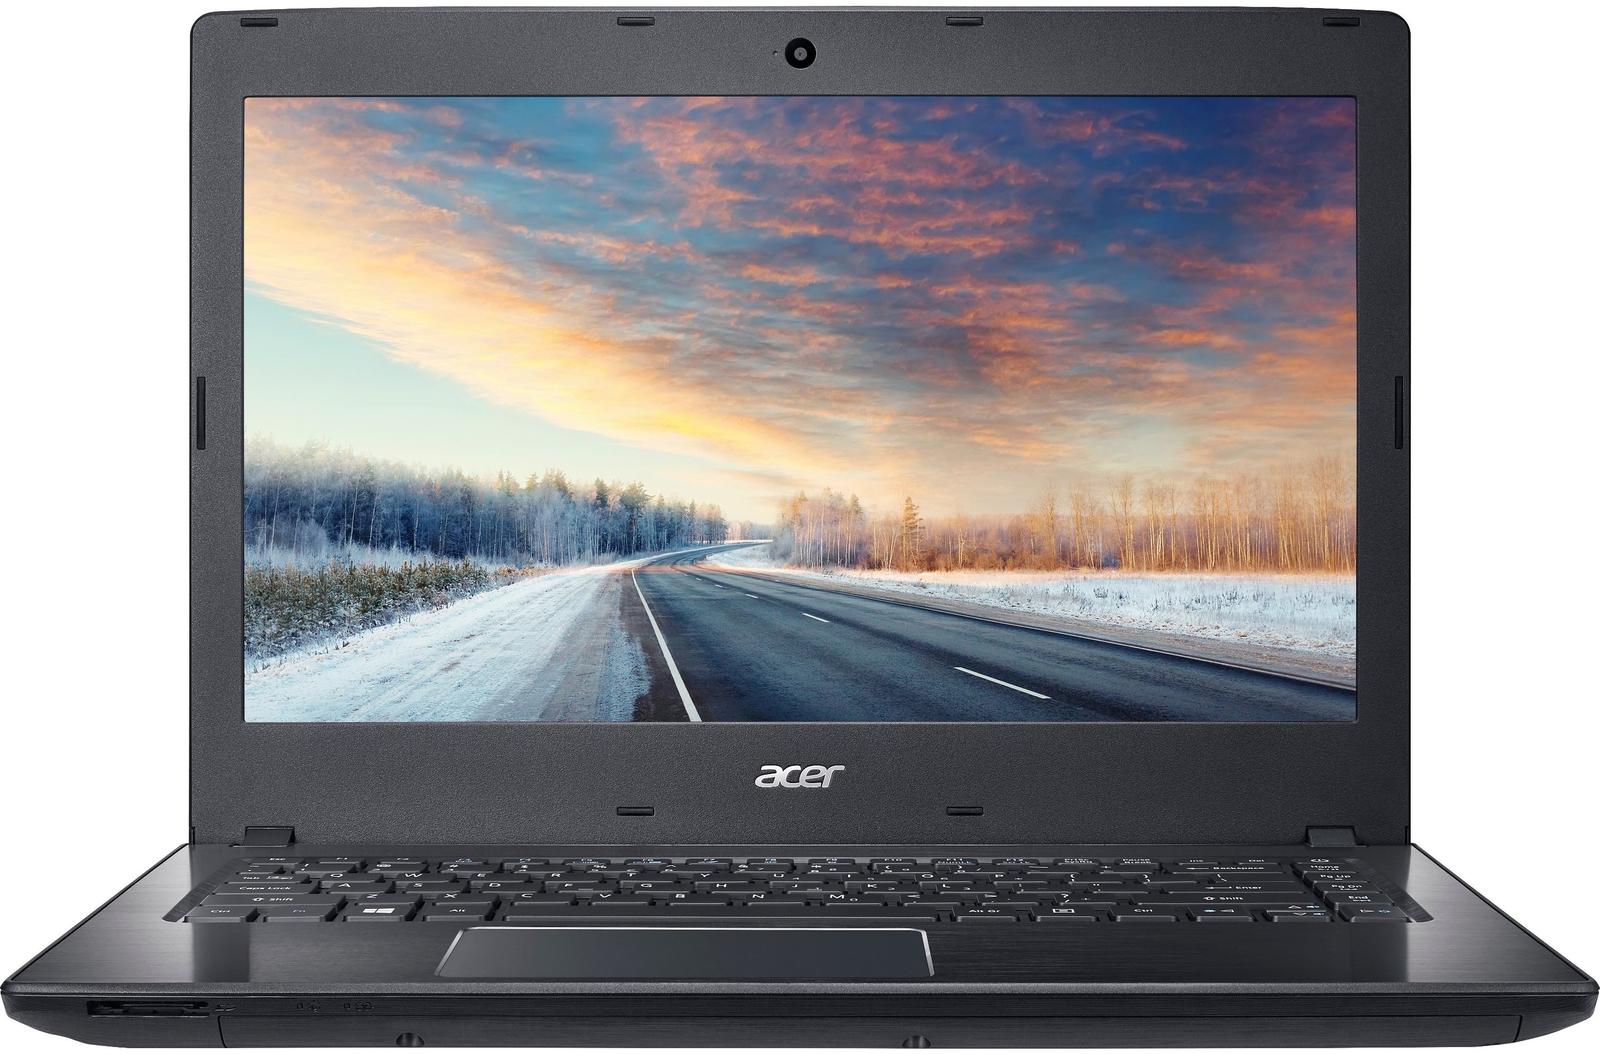 "14"" Acer Travelmate P249 i3 4GB 256GB Laptop image"